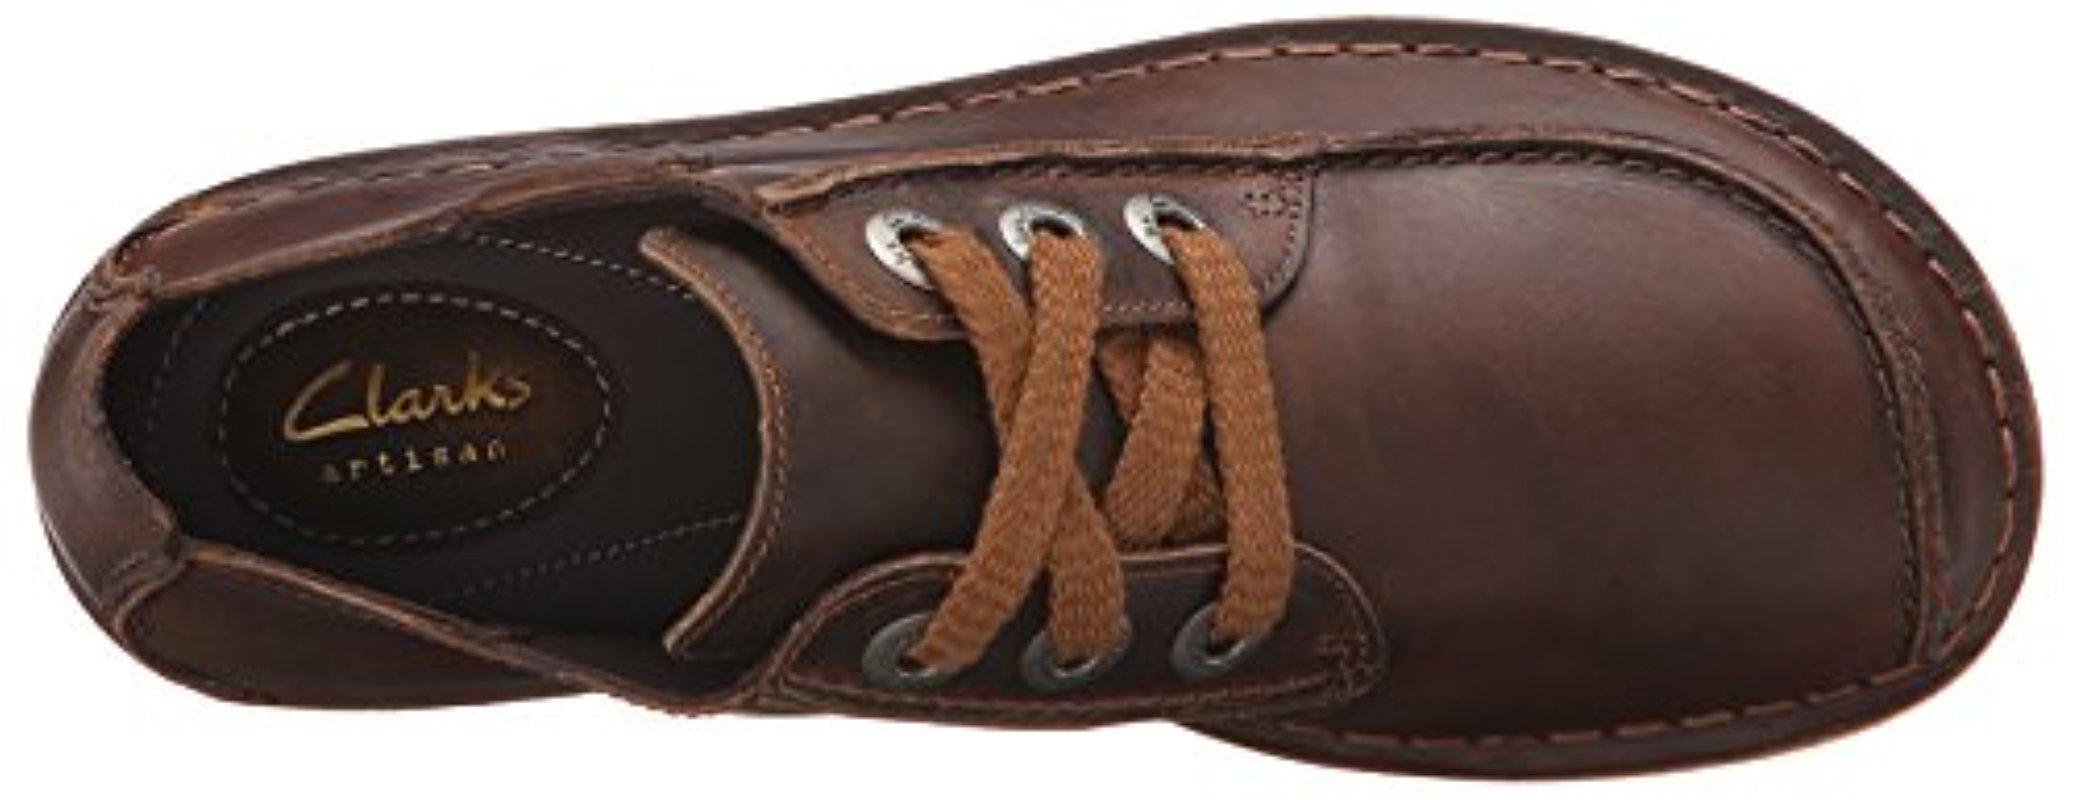 VANELi Women/'s Rodina Bark Leather Slip-on Loafer Flat